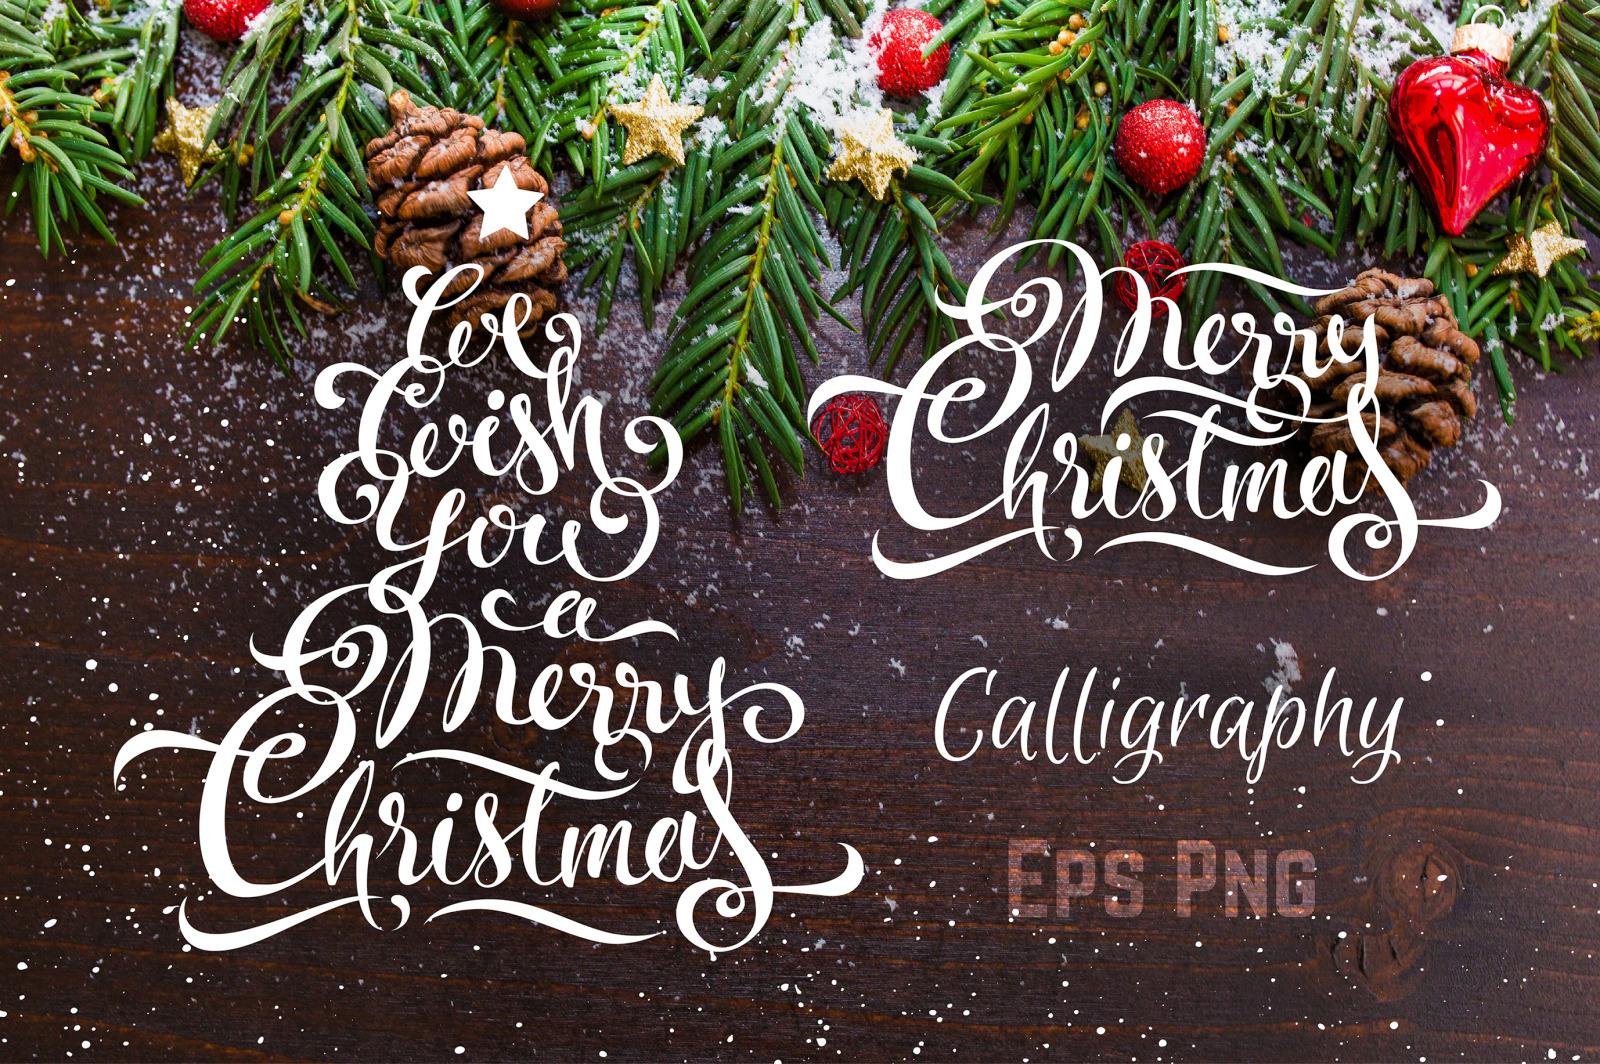 Merry Christmas Calligraphy